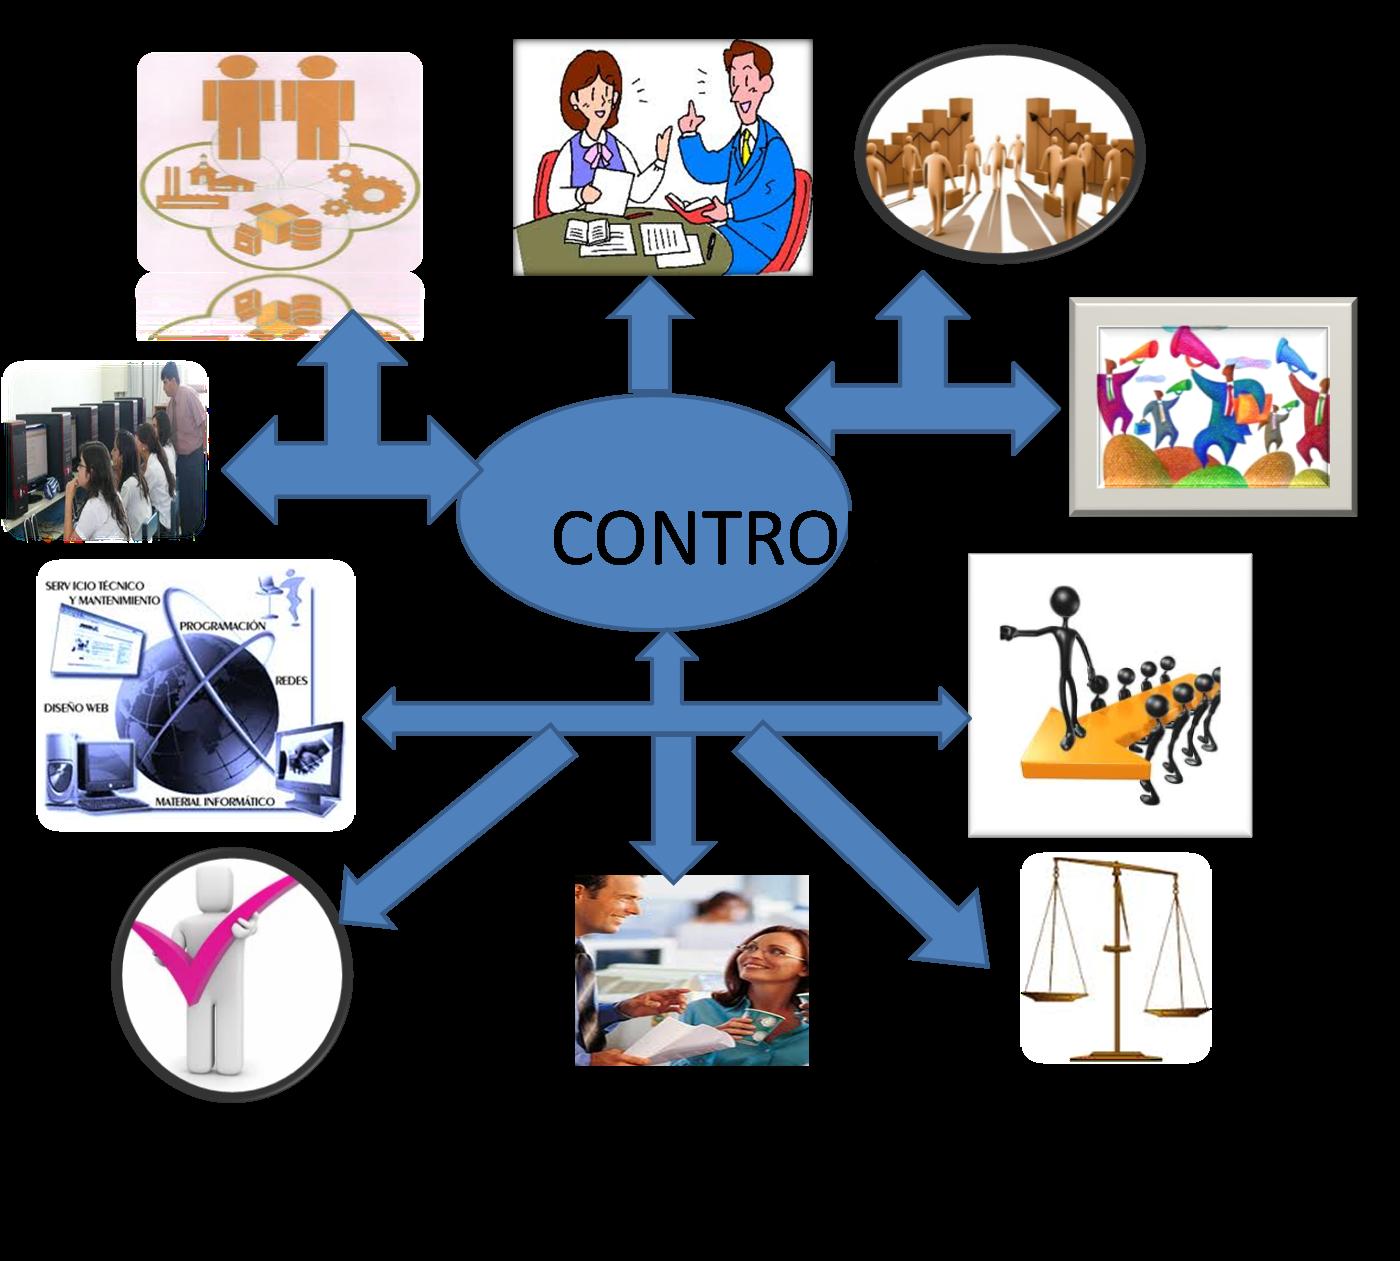 control administracion: